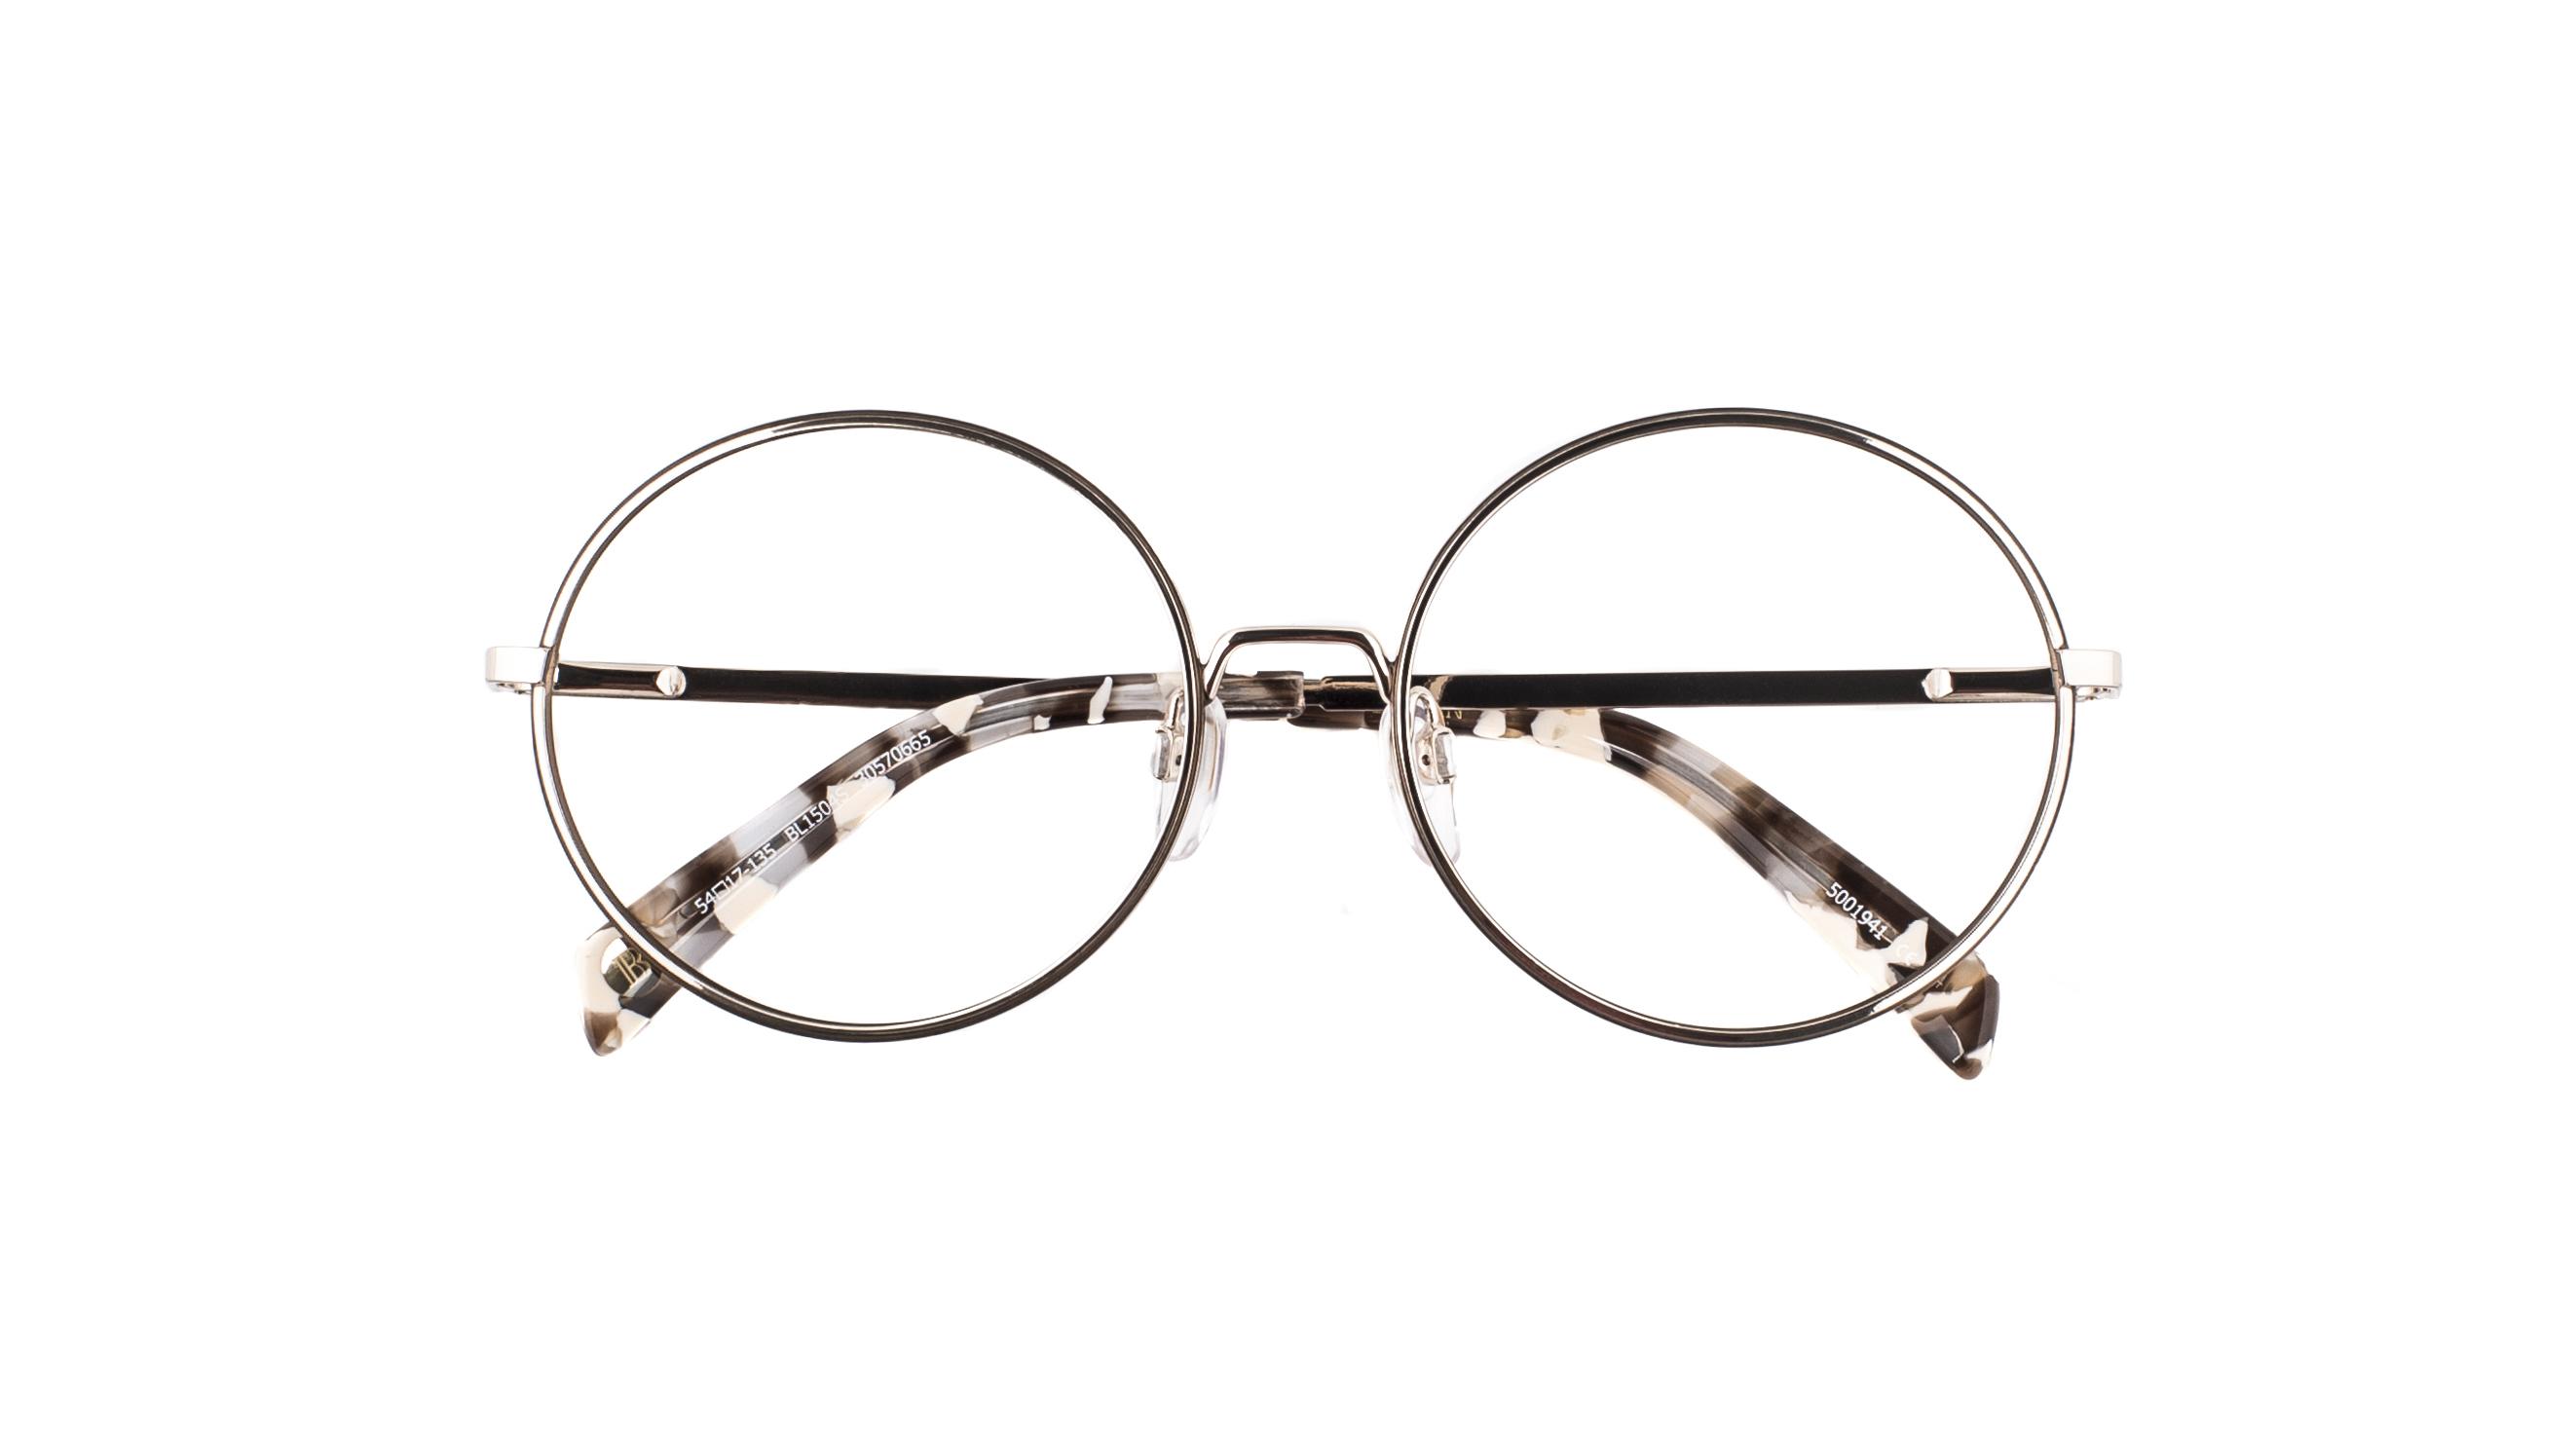 Balmain x Specsavers BL1504S 30570665 - RRP 2 pairs single vision $459 (2)